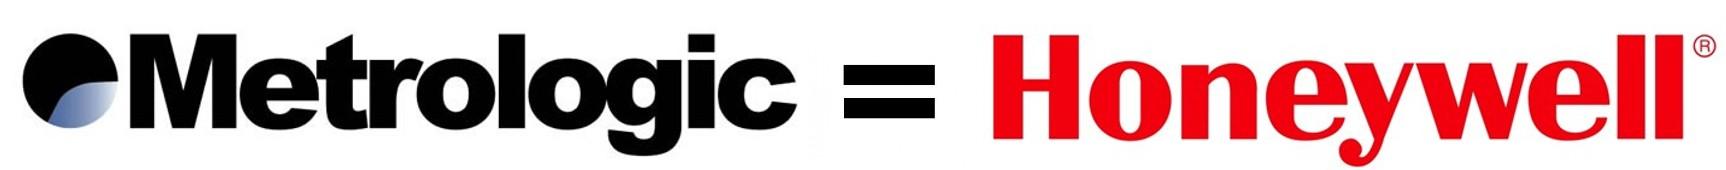 metrololgic-equals-honeywell.jpg